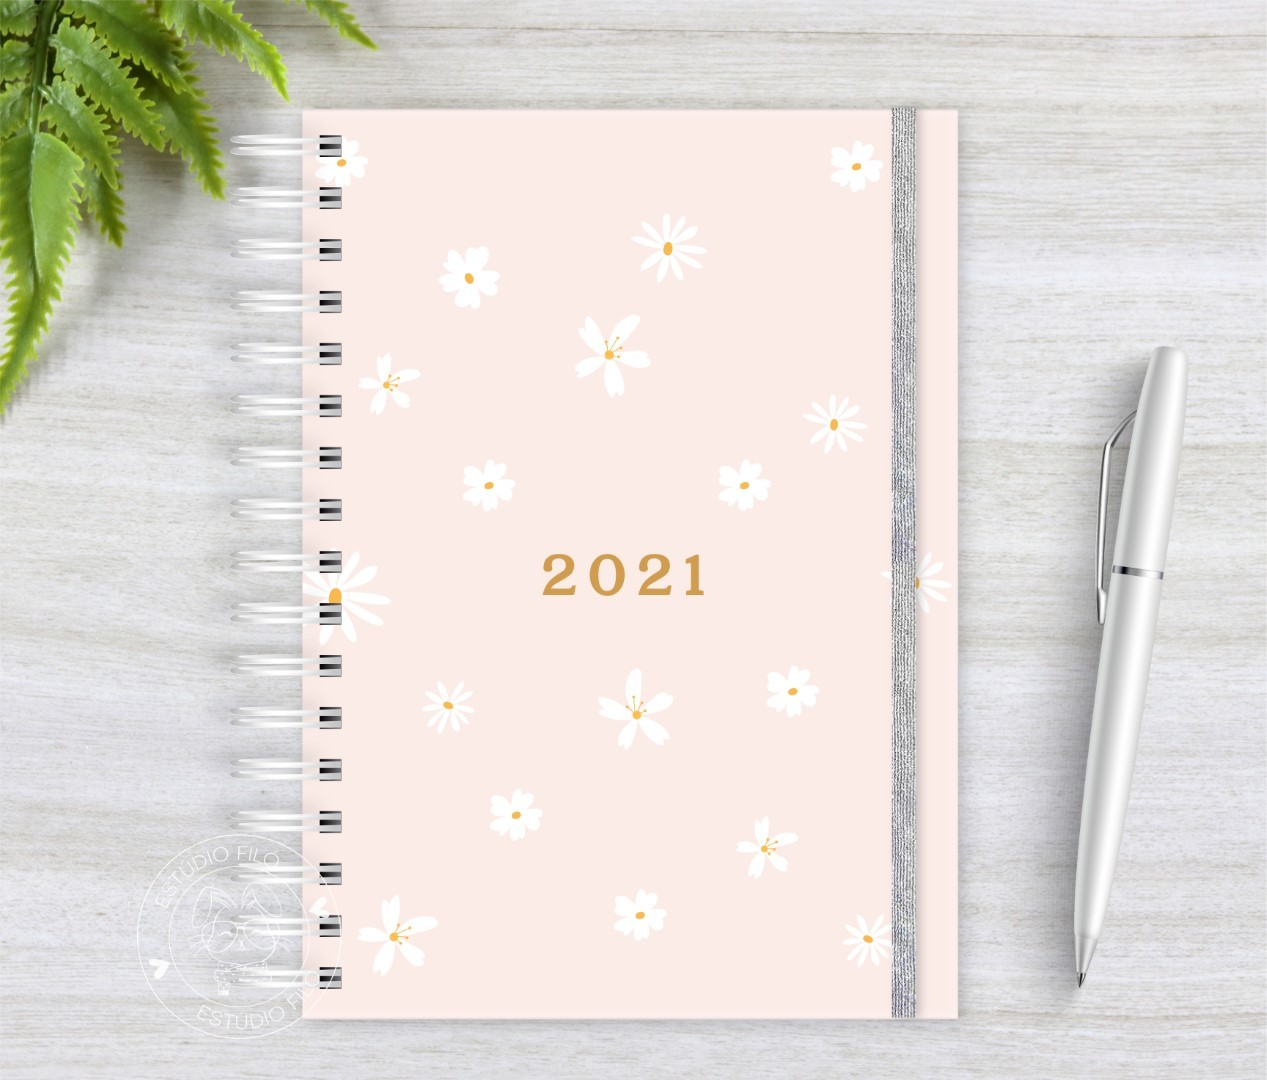 Agenda margarida 2021